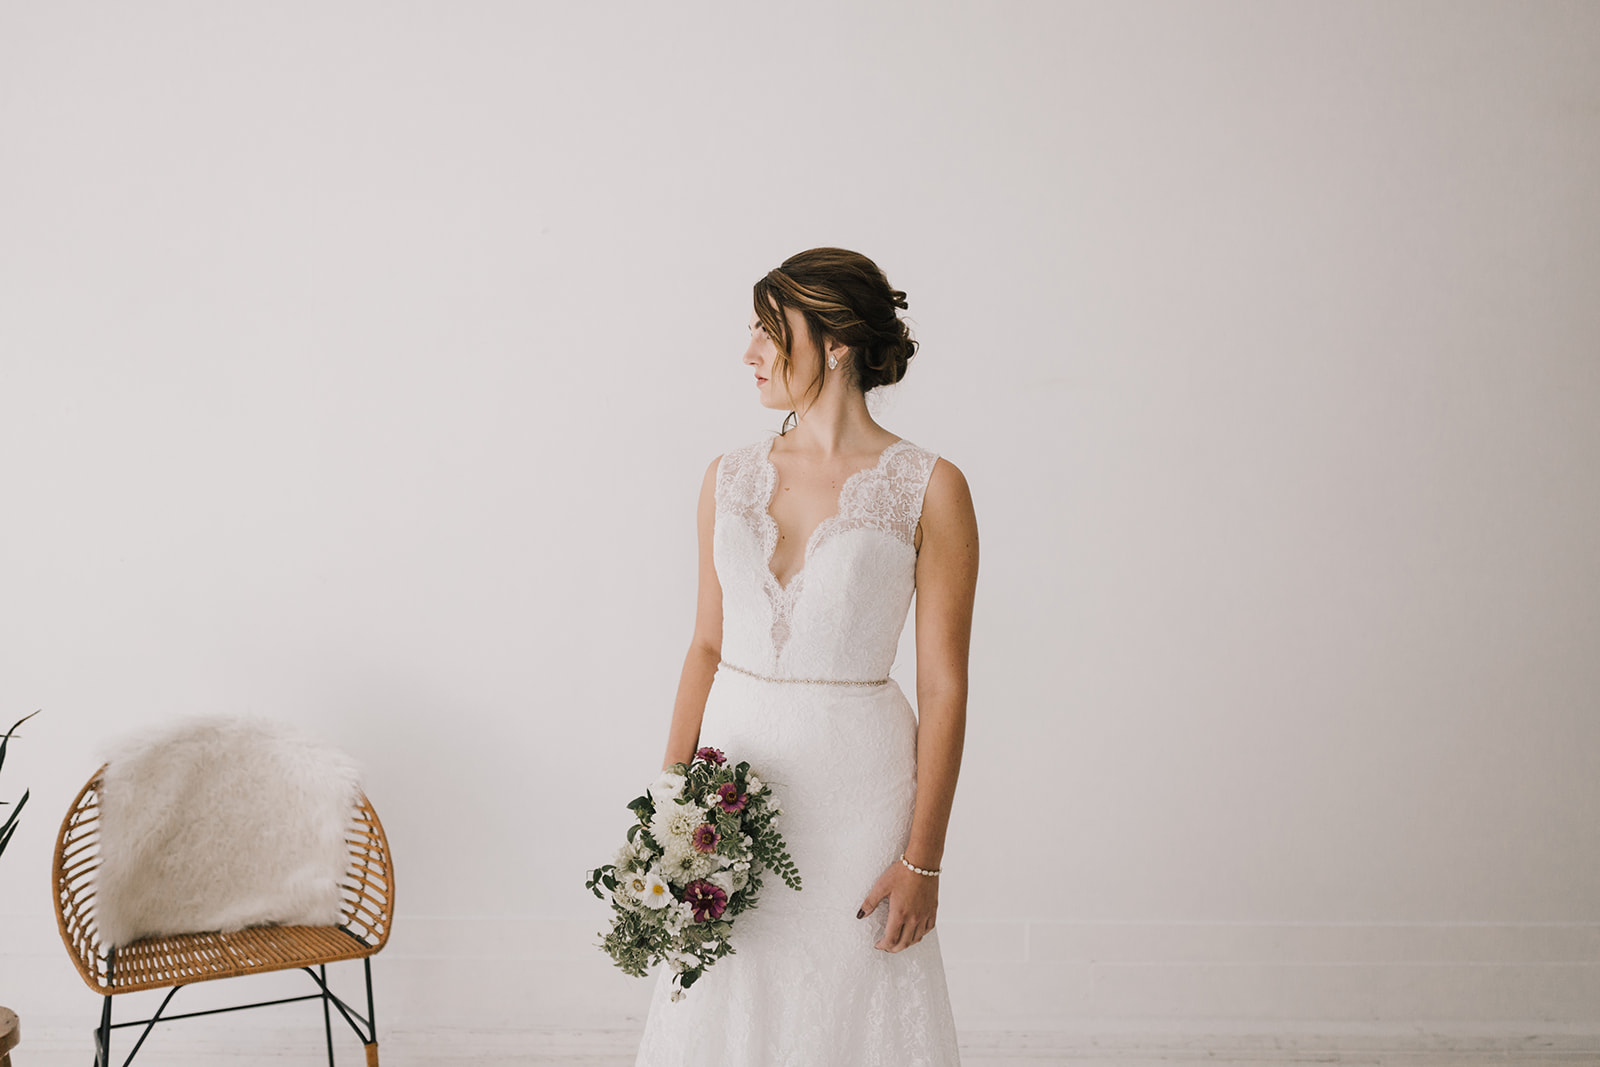 Photography:  Alyssa Barletter Photography  // Gown:  Lis Simon Bridal